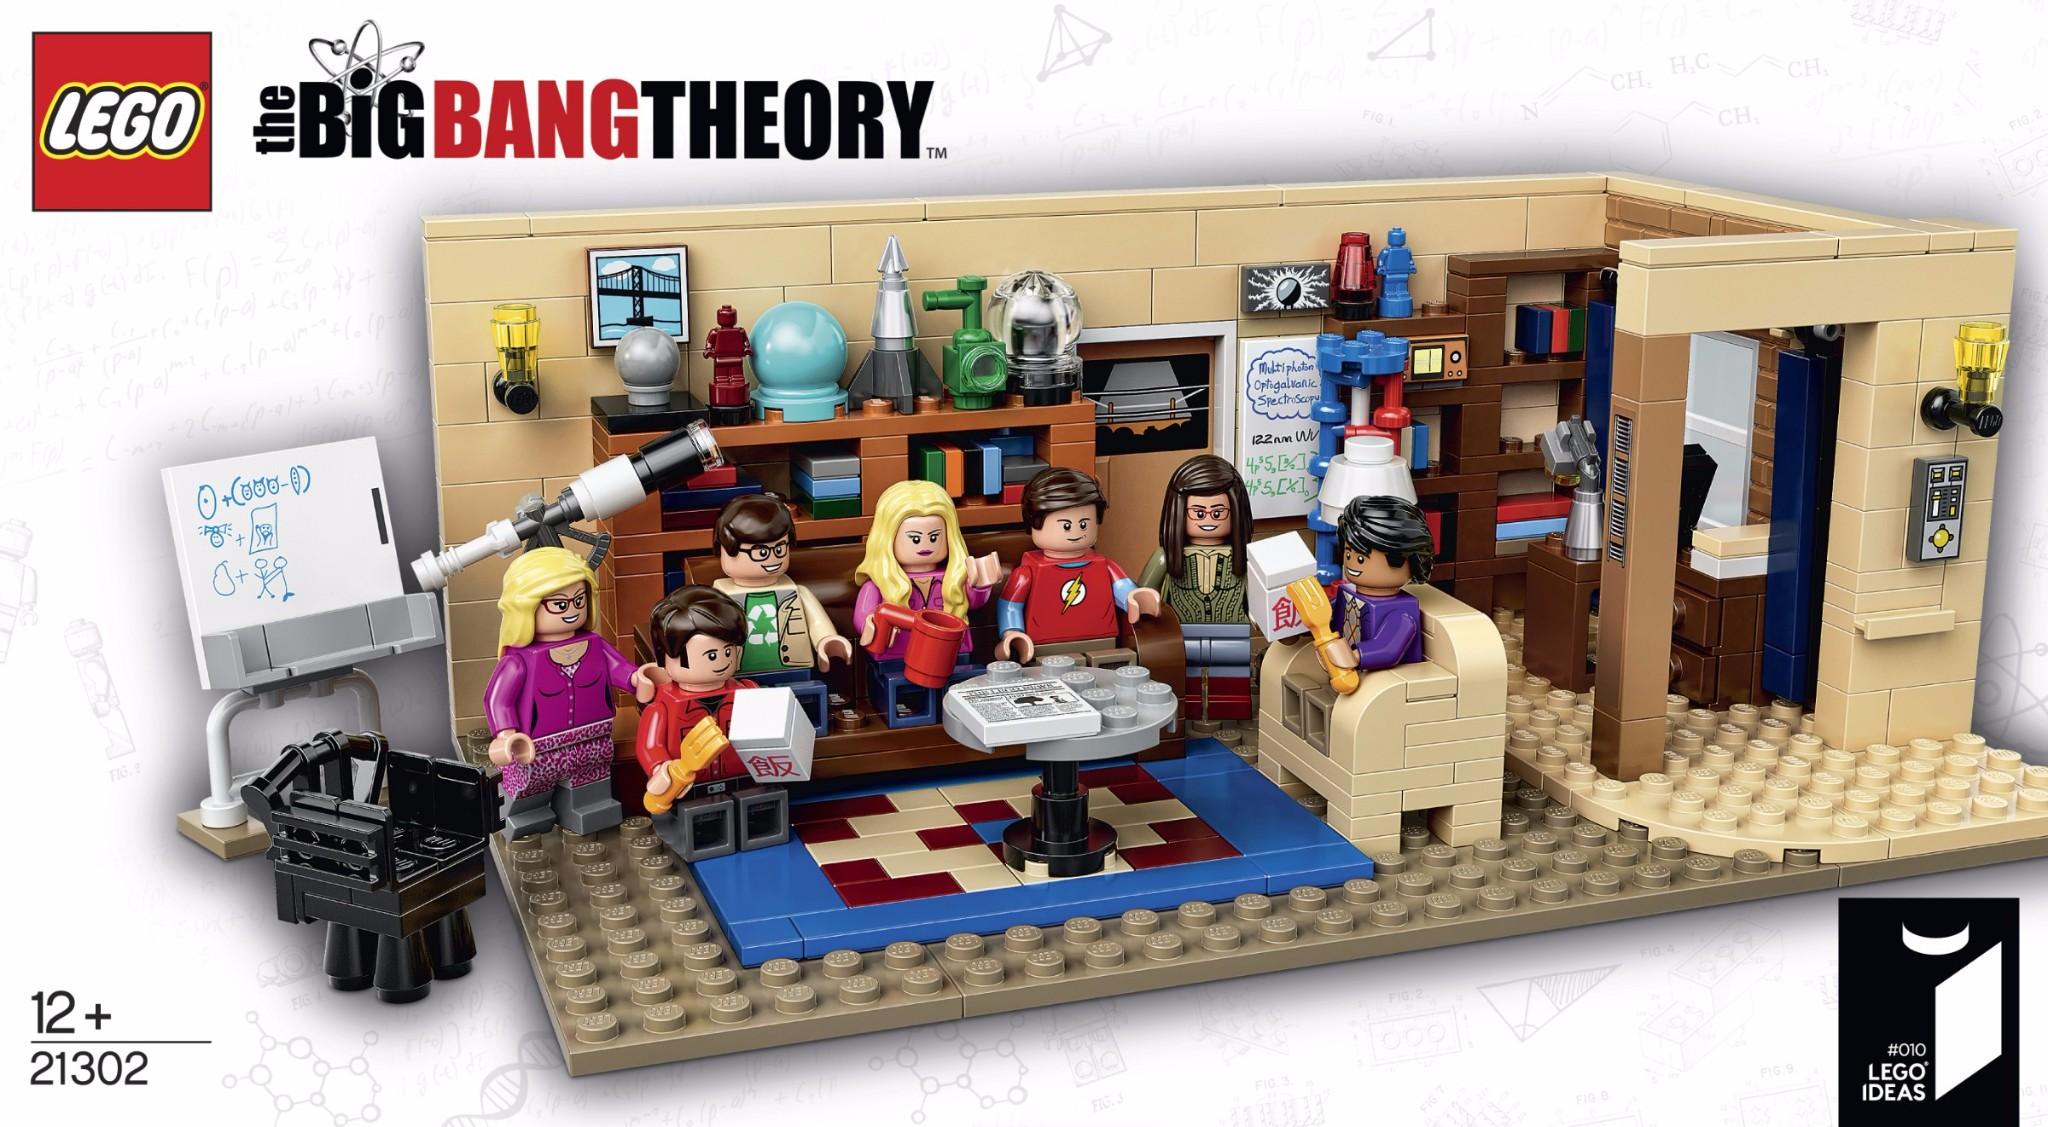 LEGO # 21302 IDEAS THE BIG BANG THEORY